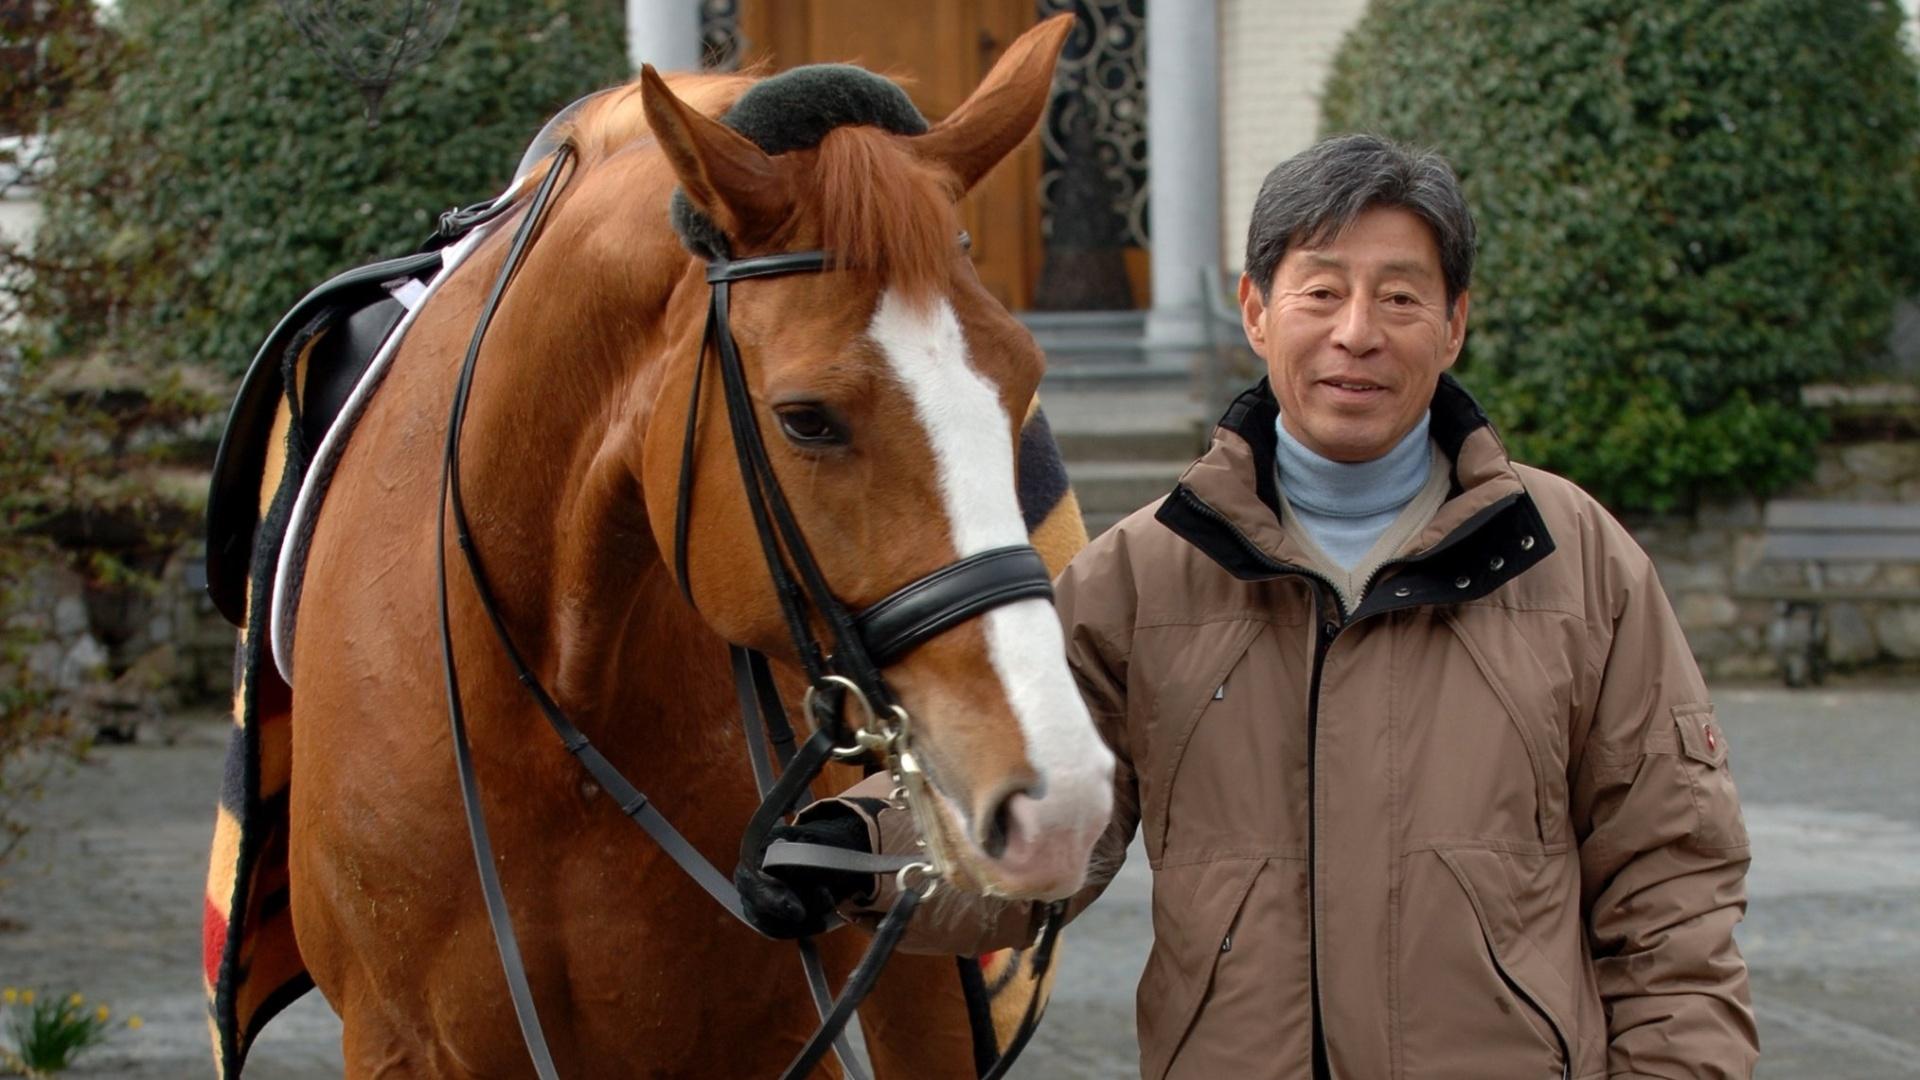 Hiroshi Hoketsu, cavaleiro japonês, que conseguiu vaga para Londres aos 70 anos de idade